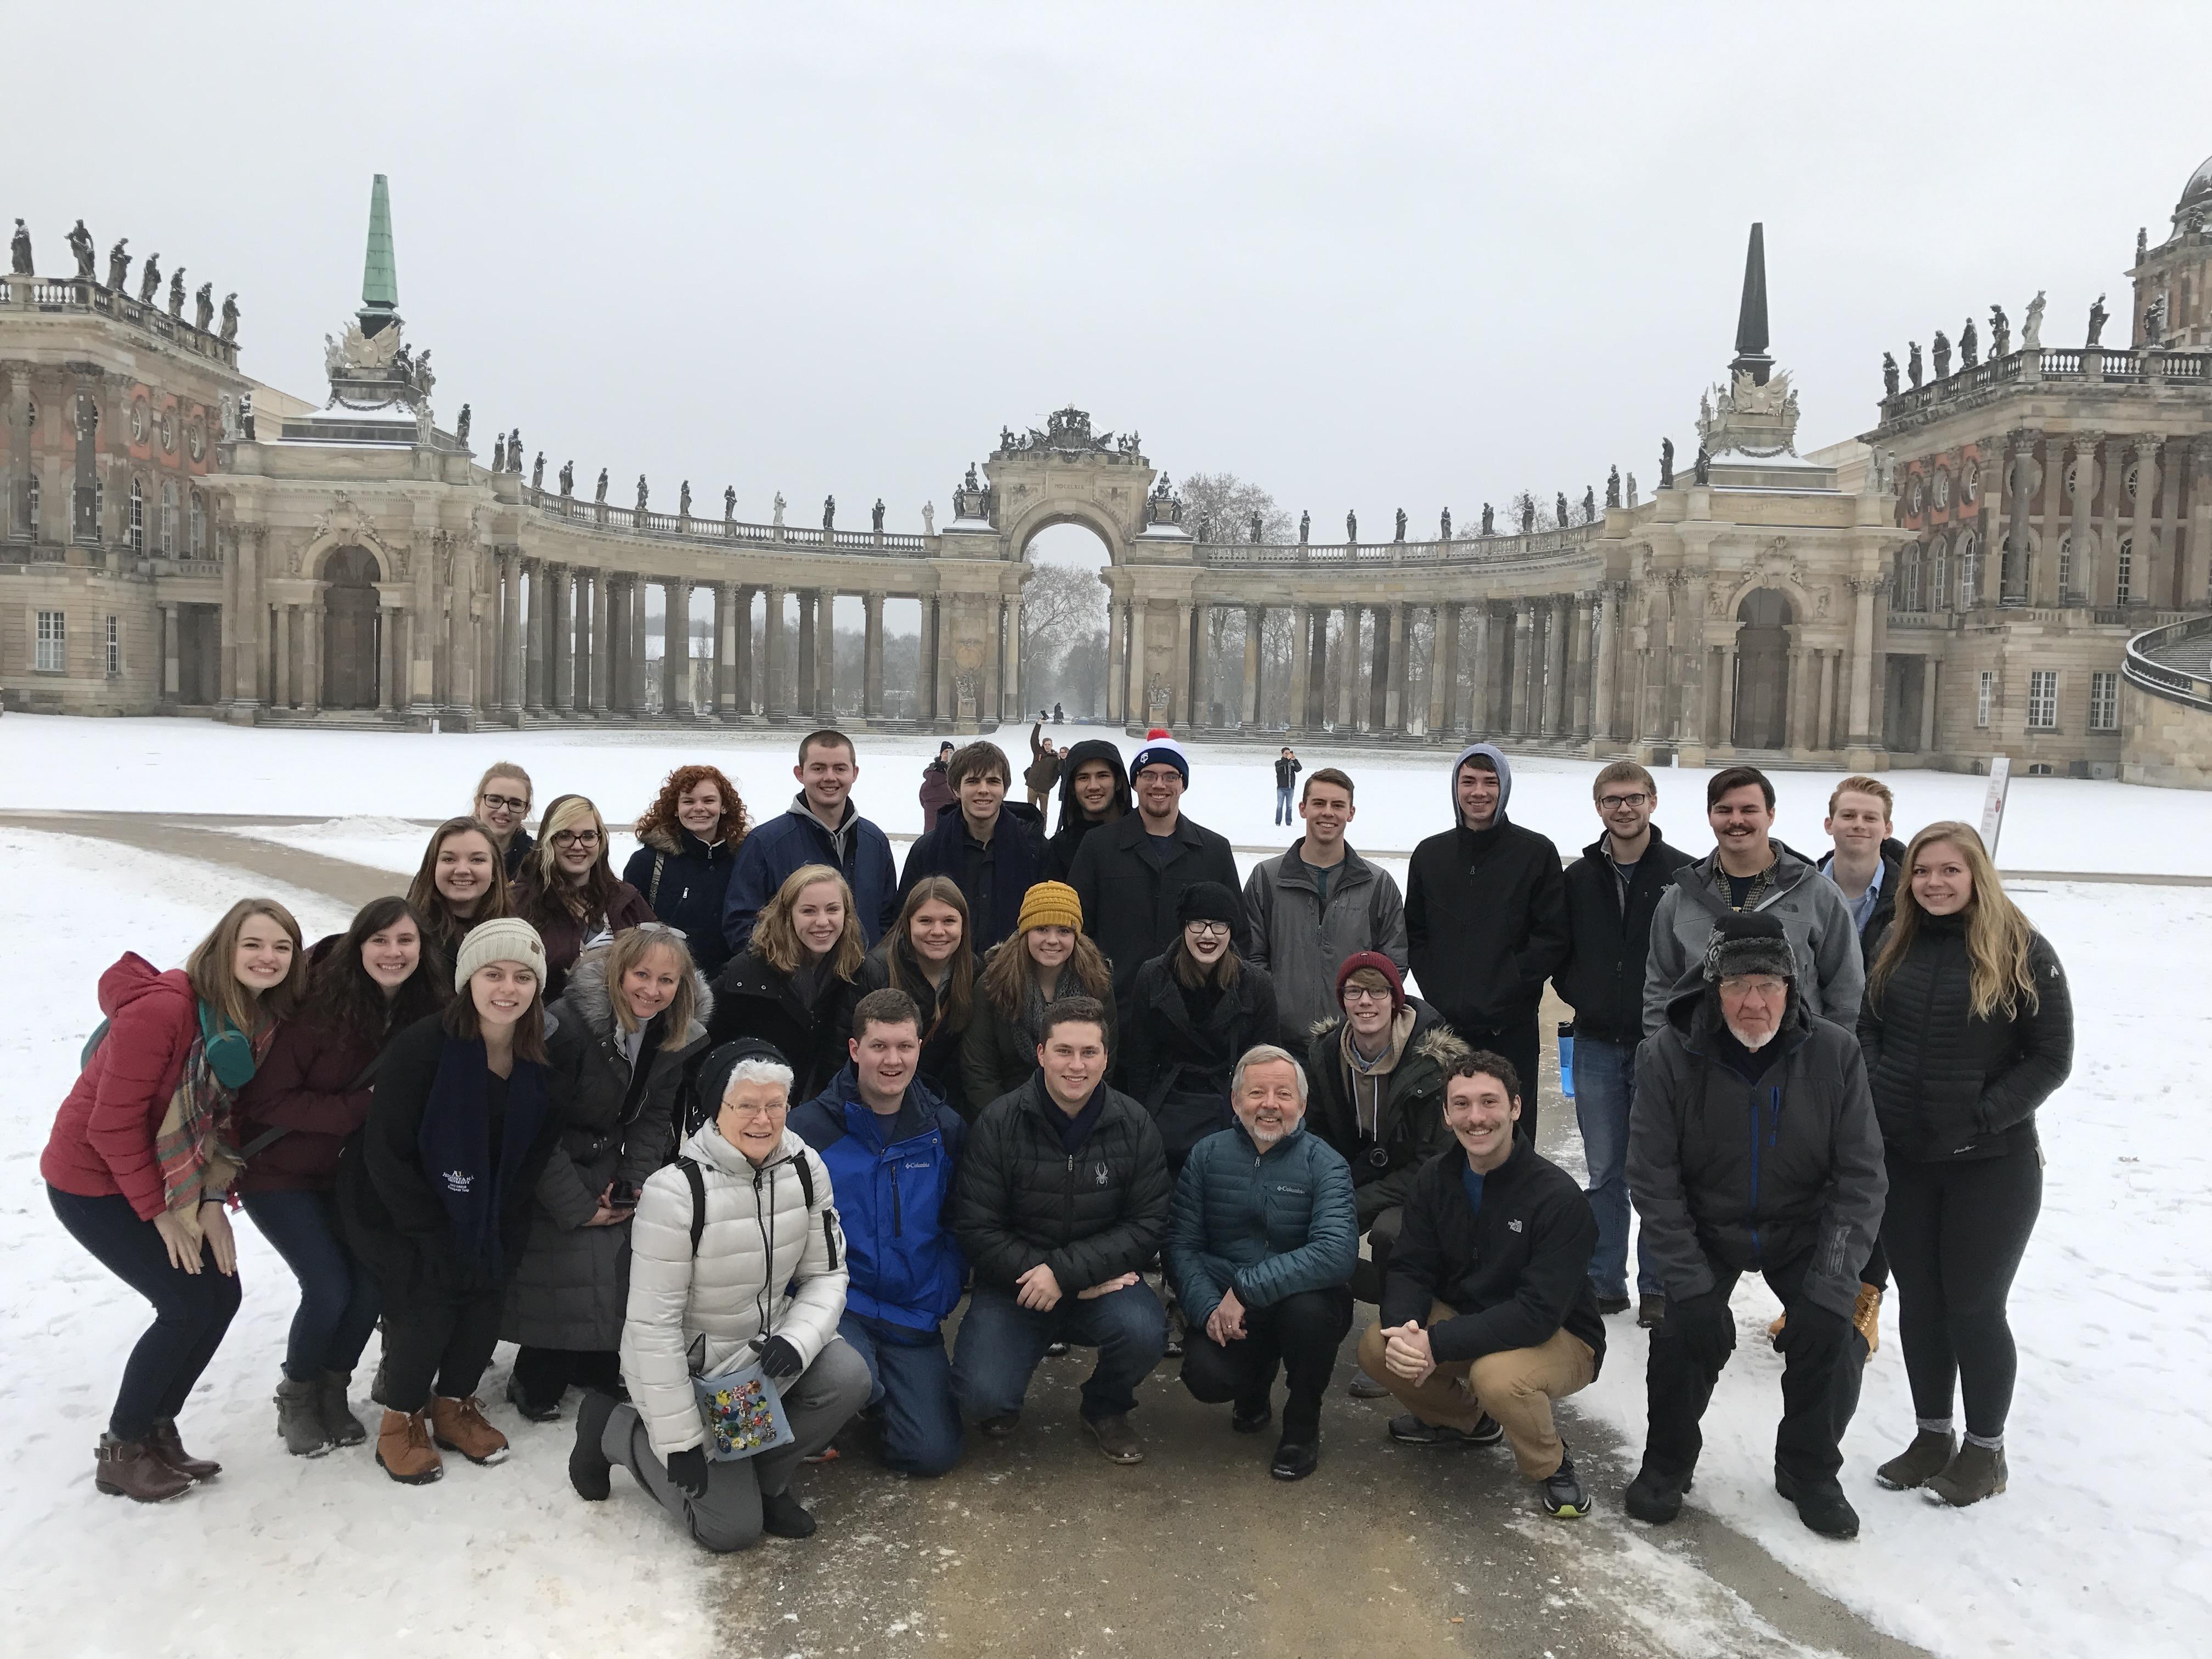 Potsdam palace